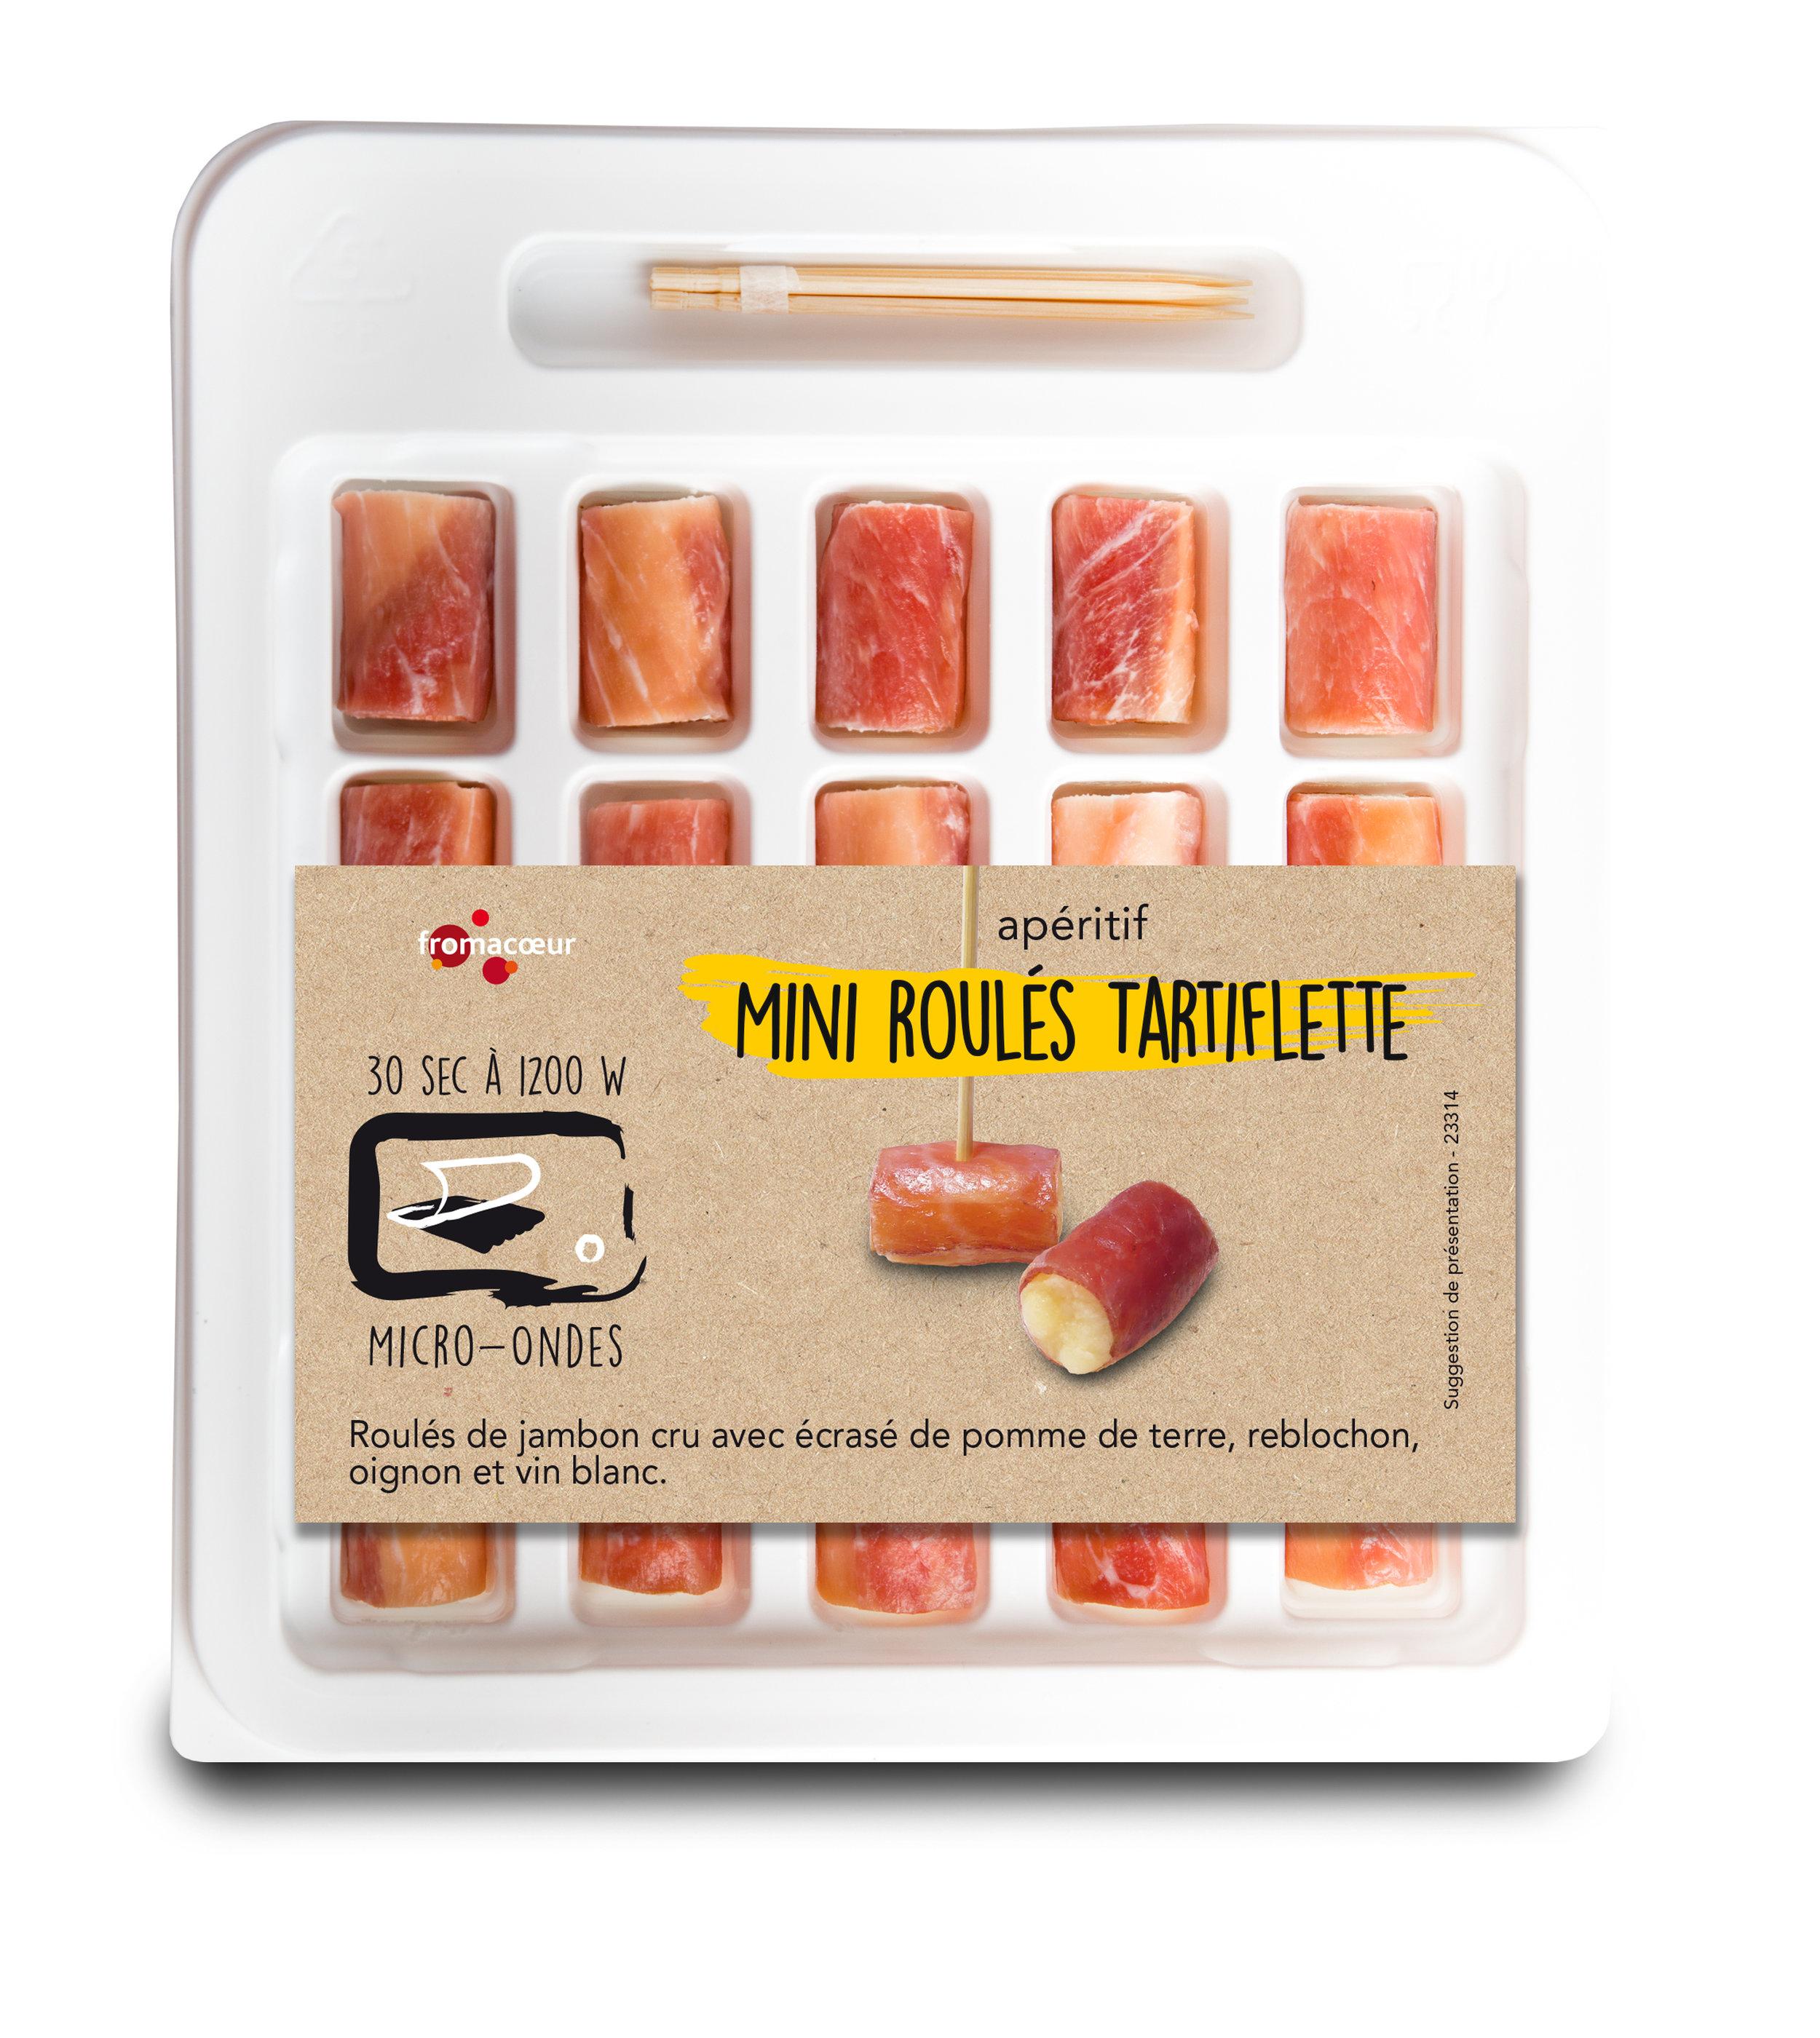 Mini roulés tartiflette.jpg